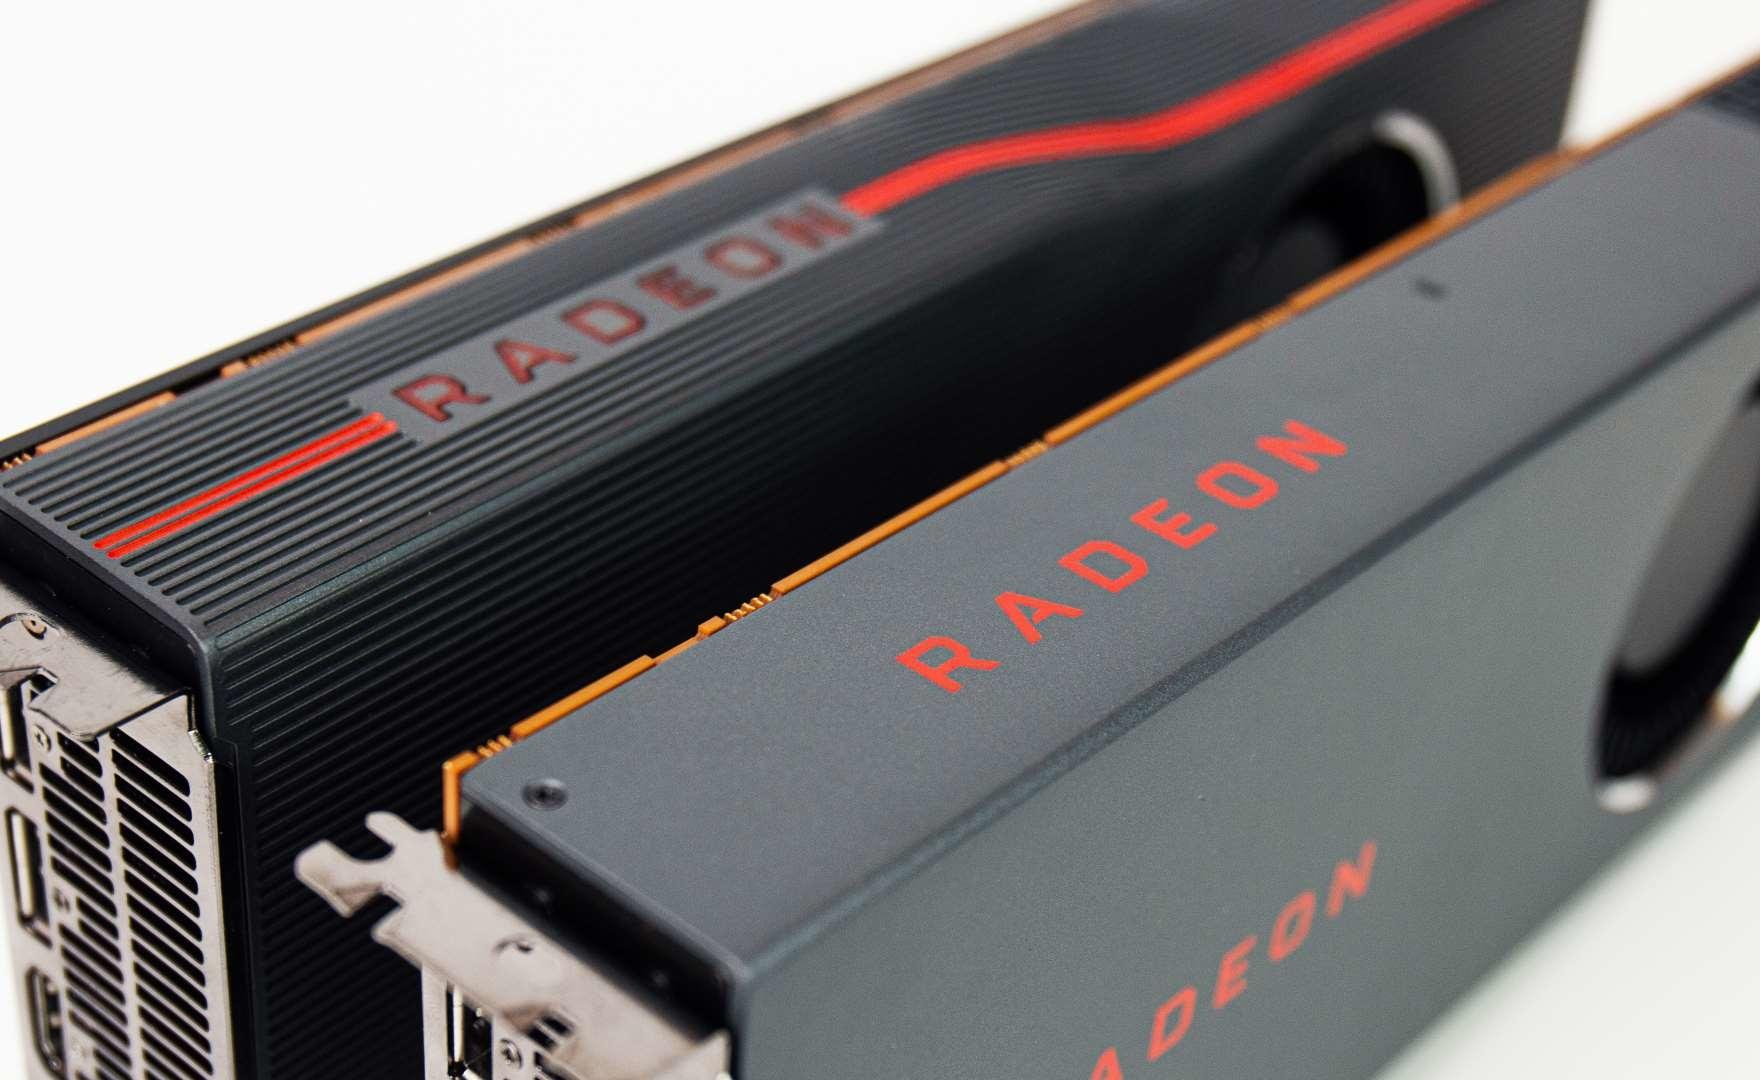 Radeon RX 5700 a 2,2 GHz con la mod SPPT